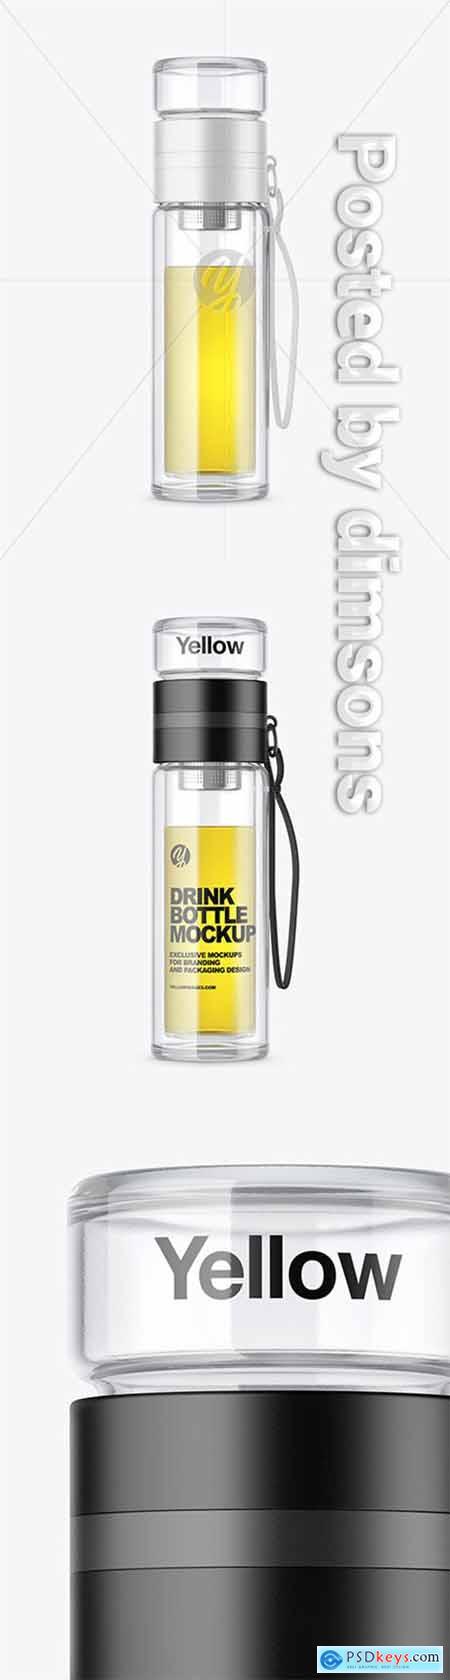 Glass Bottle Mockup 51514